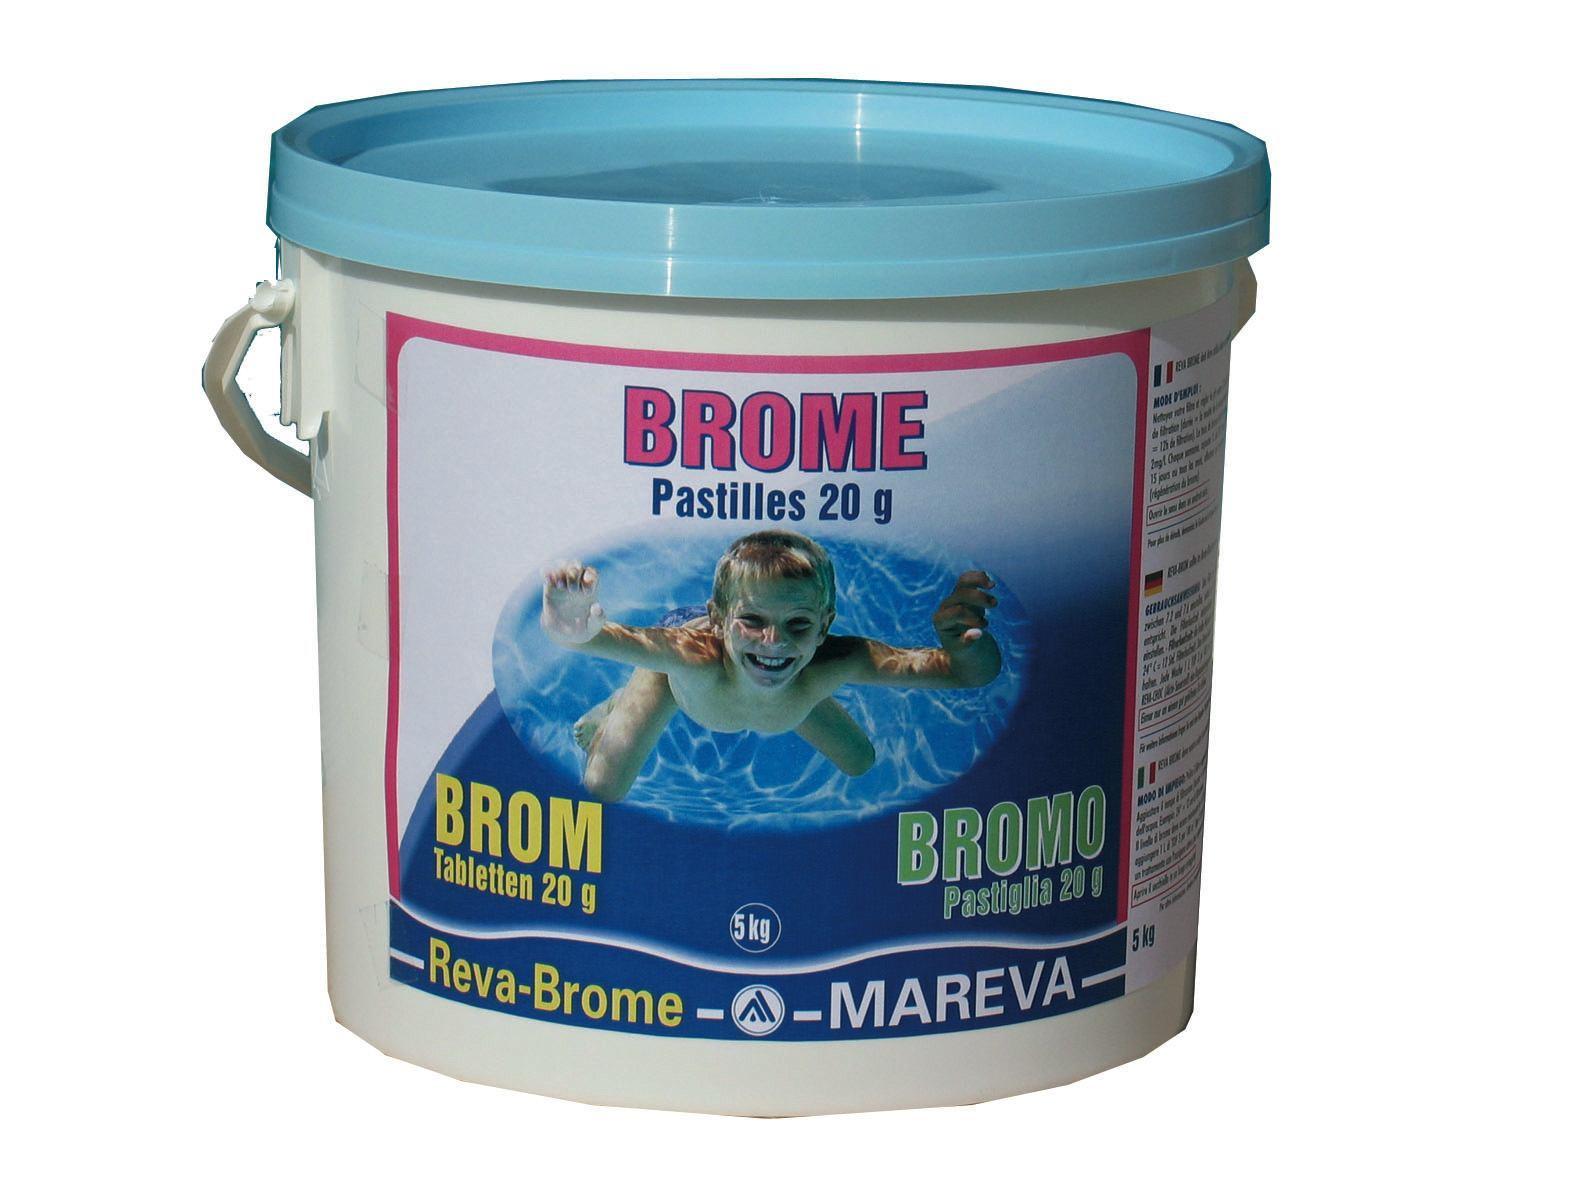 produits traitement piscine savoie piscines spas. Black Bedroom Furniture Sets. Home Design Ideas